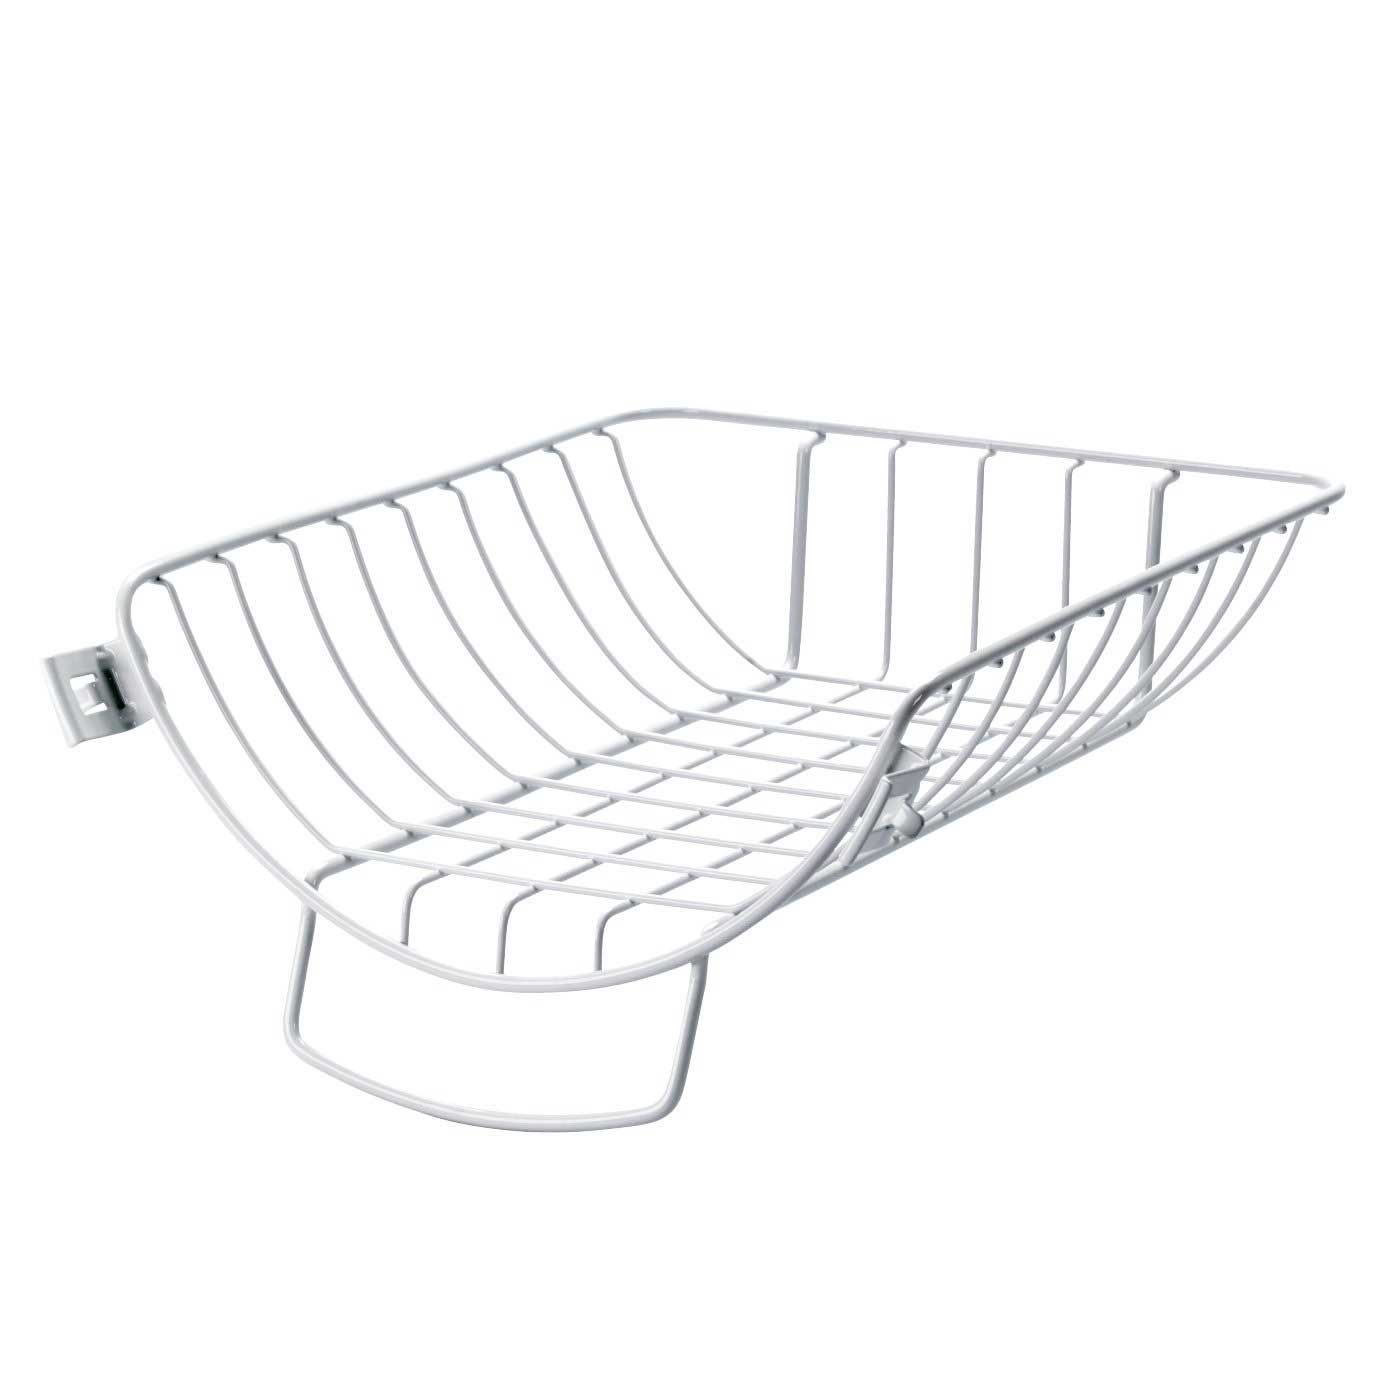 Miele TK111 tumble dryer basket